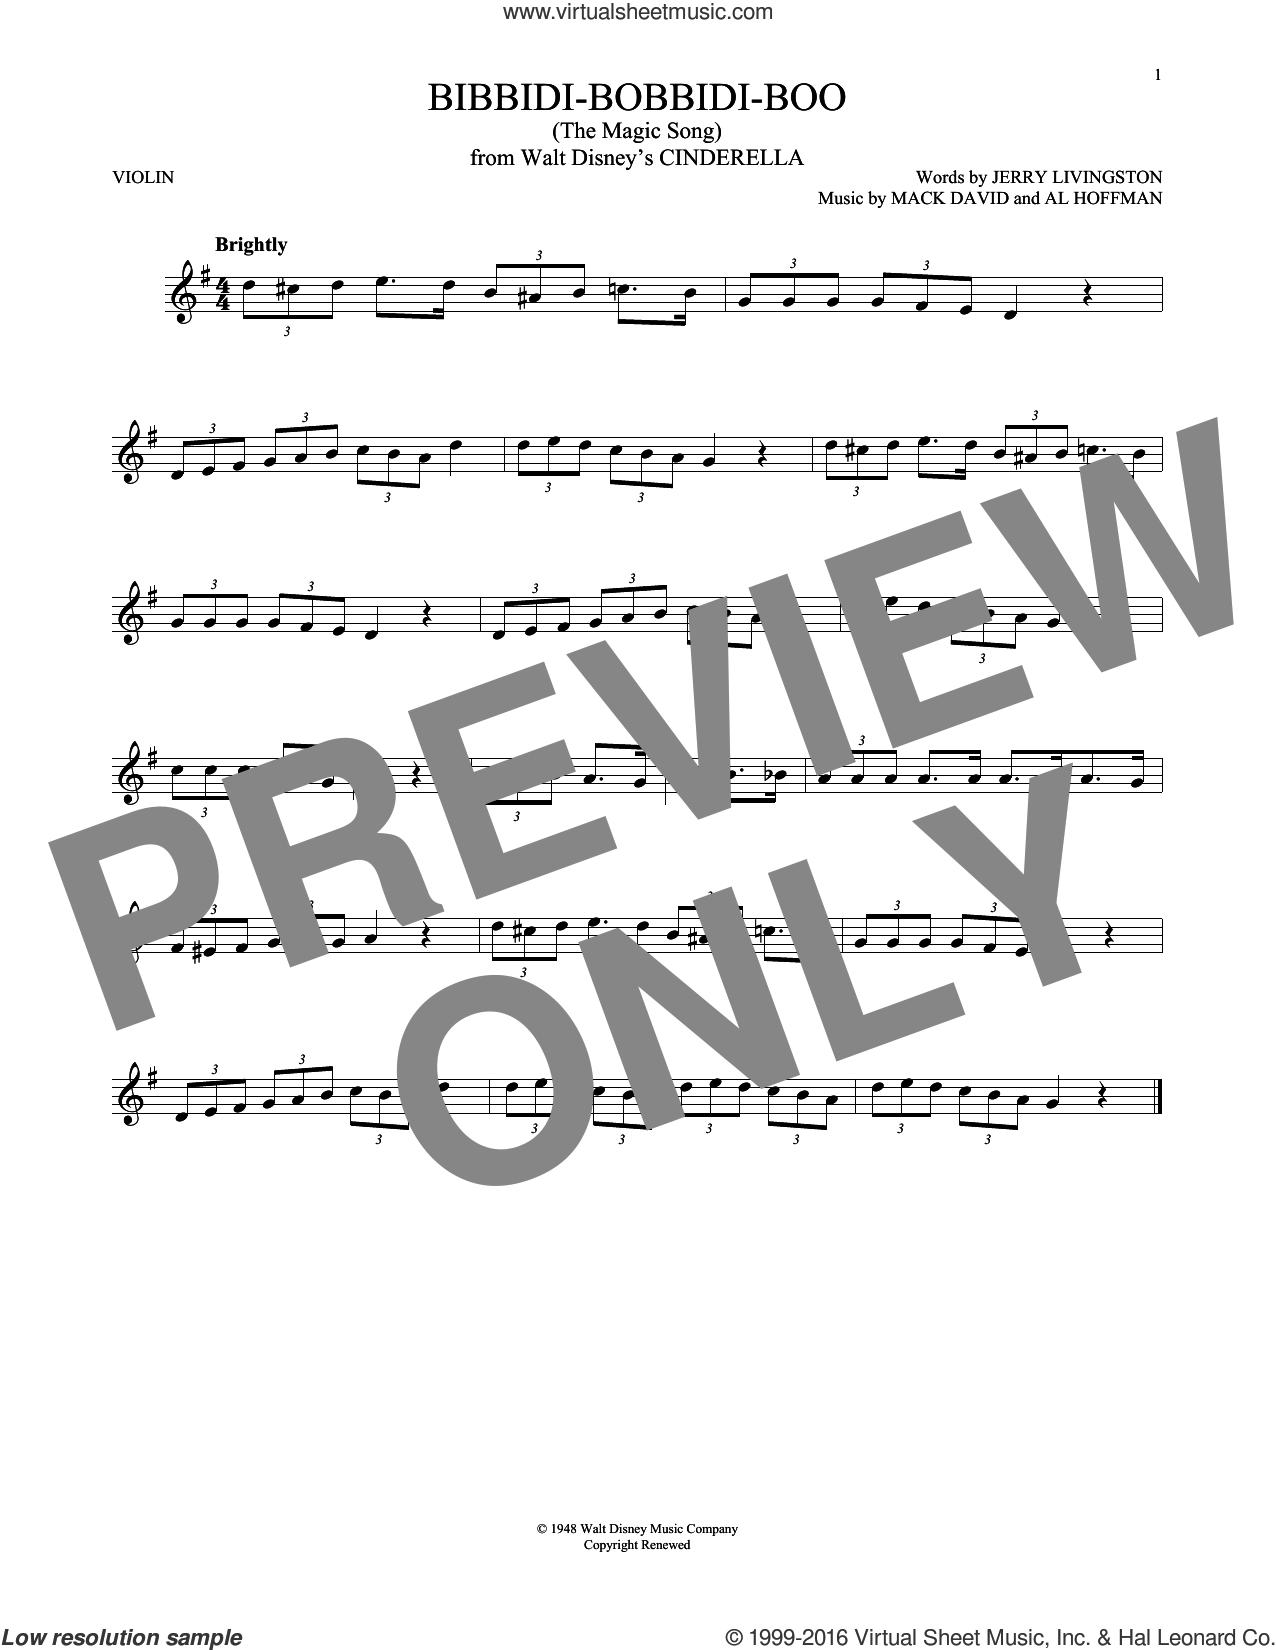 Bibbidi-Bobbidi-Boo (The Magic Song) sheet music for violin solo by Jerry Livingston, Al Hoffman and Mack David, intermediate skill level